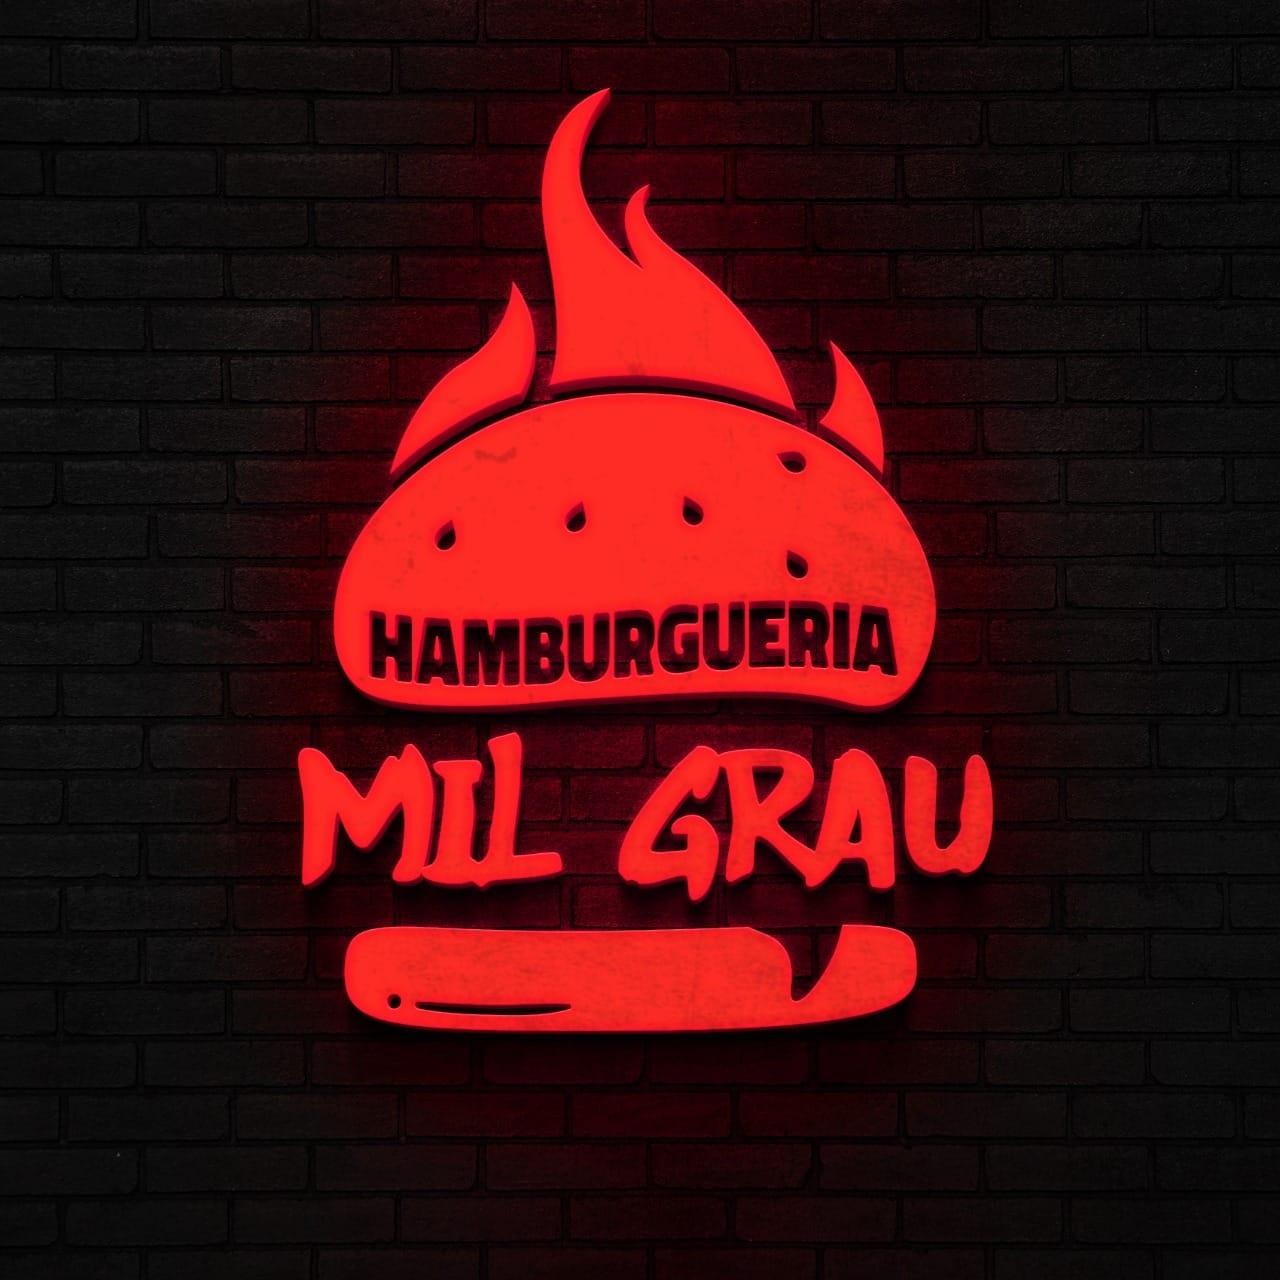 Hamburgueria Mil Grau